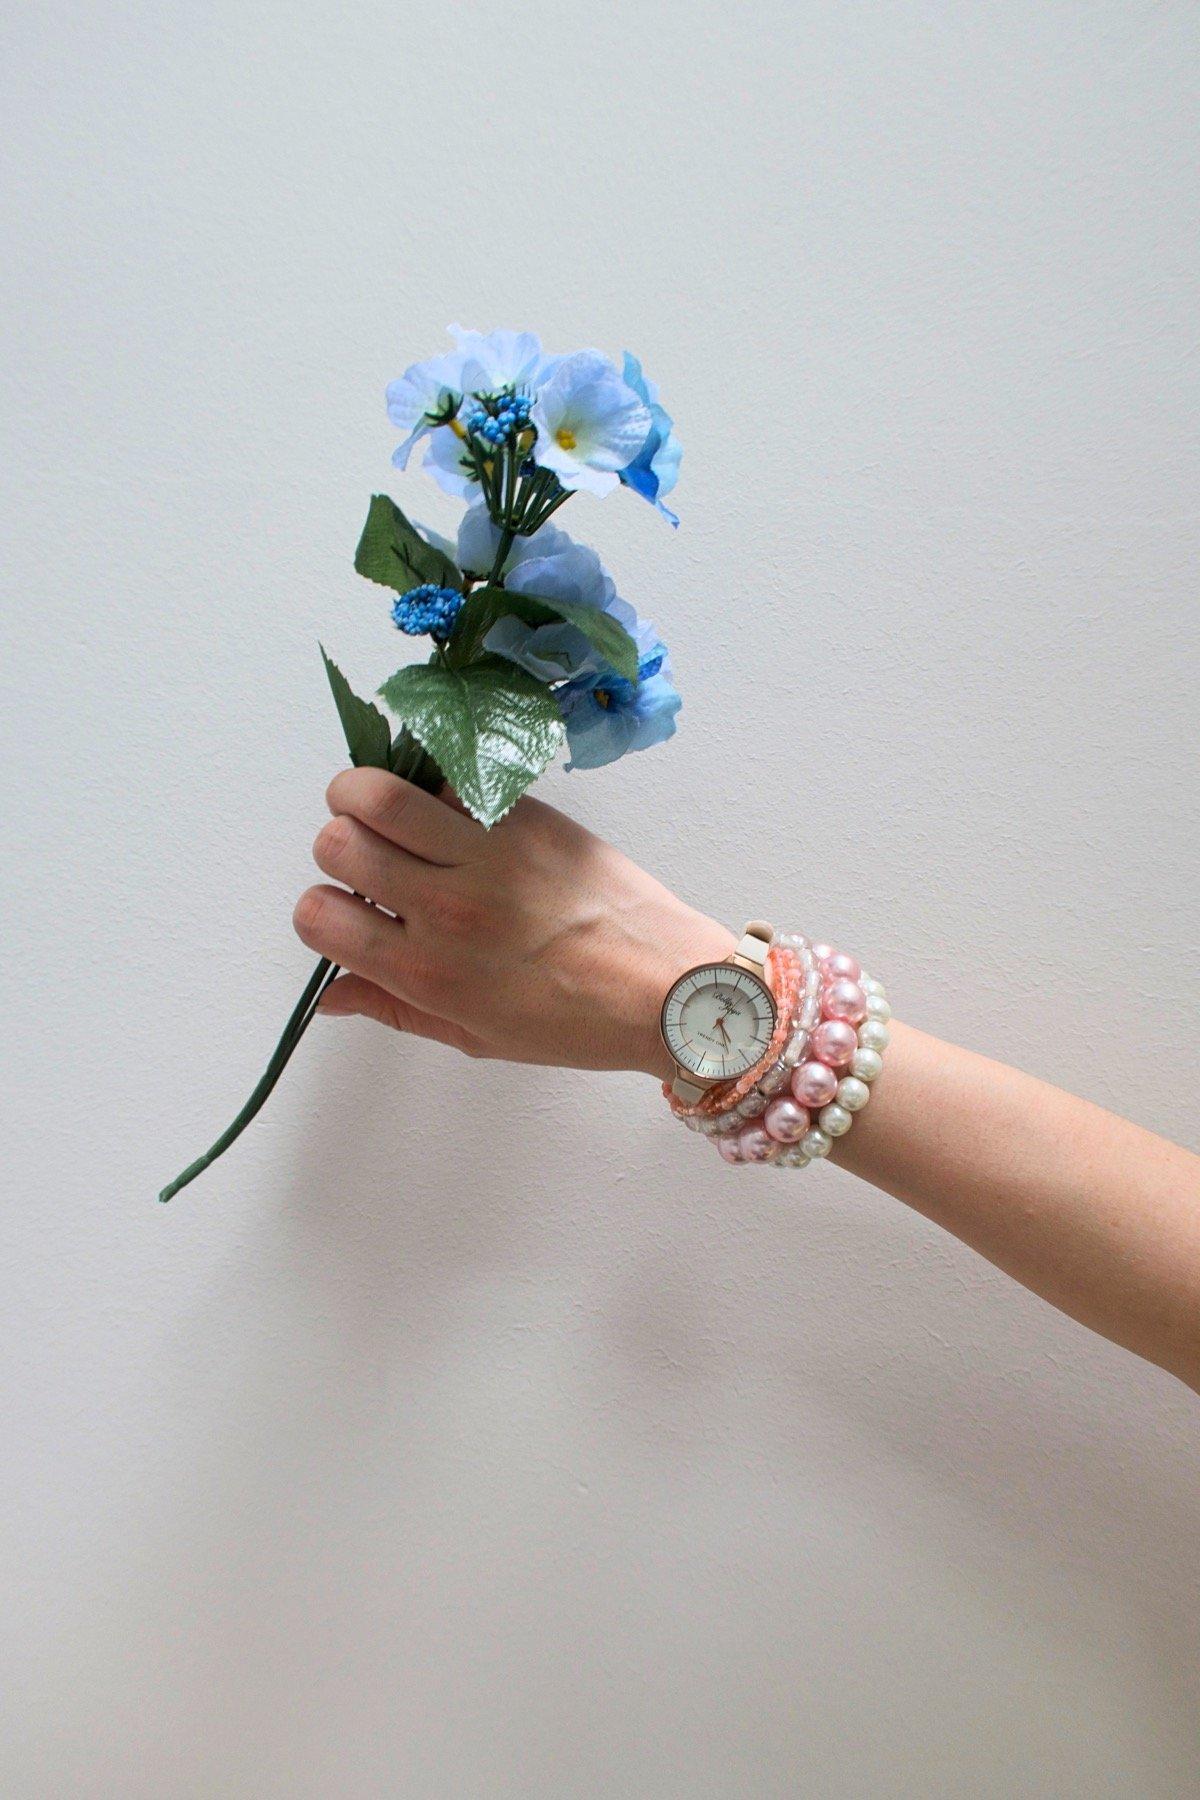 jenna minnie jennaminnie fashion blog otto weitzmann